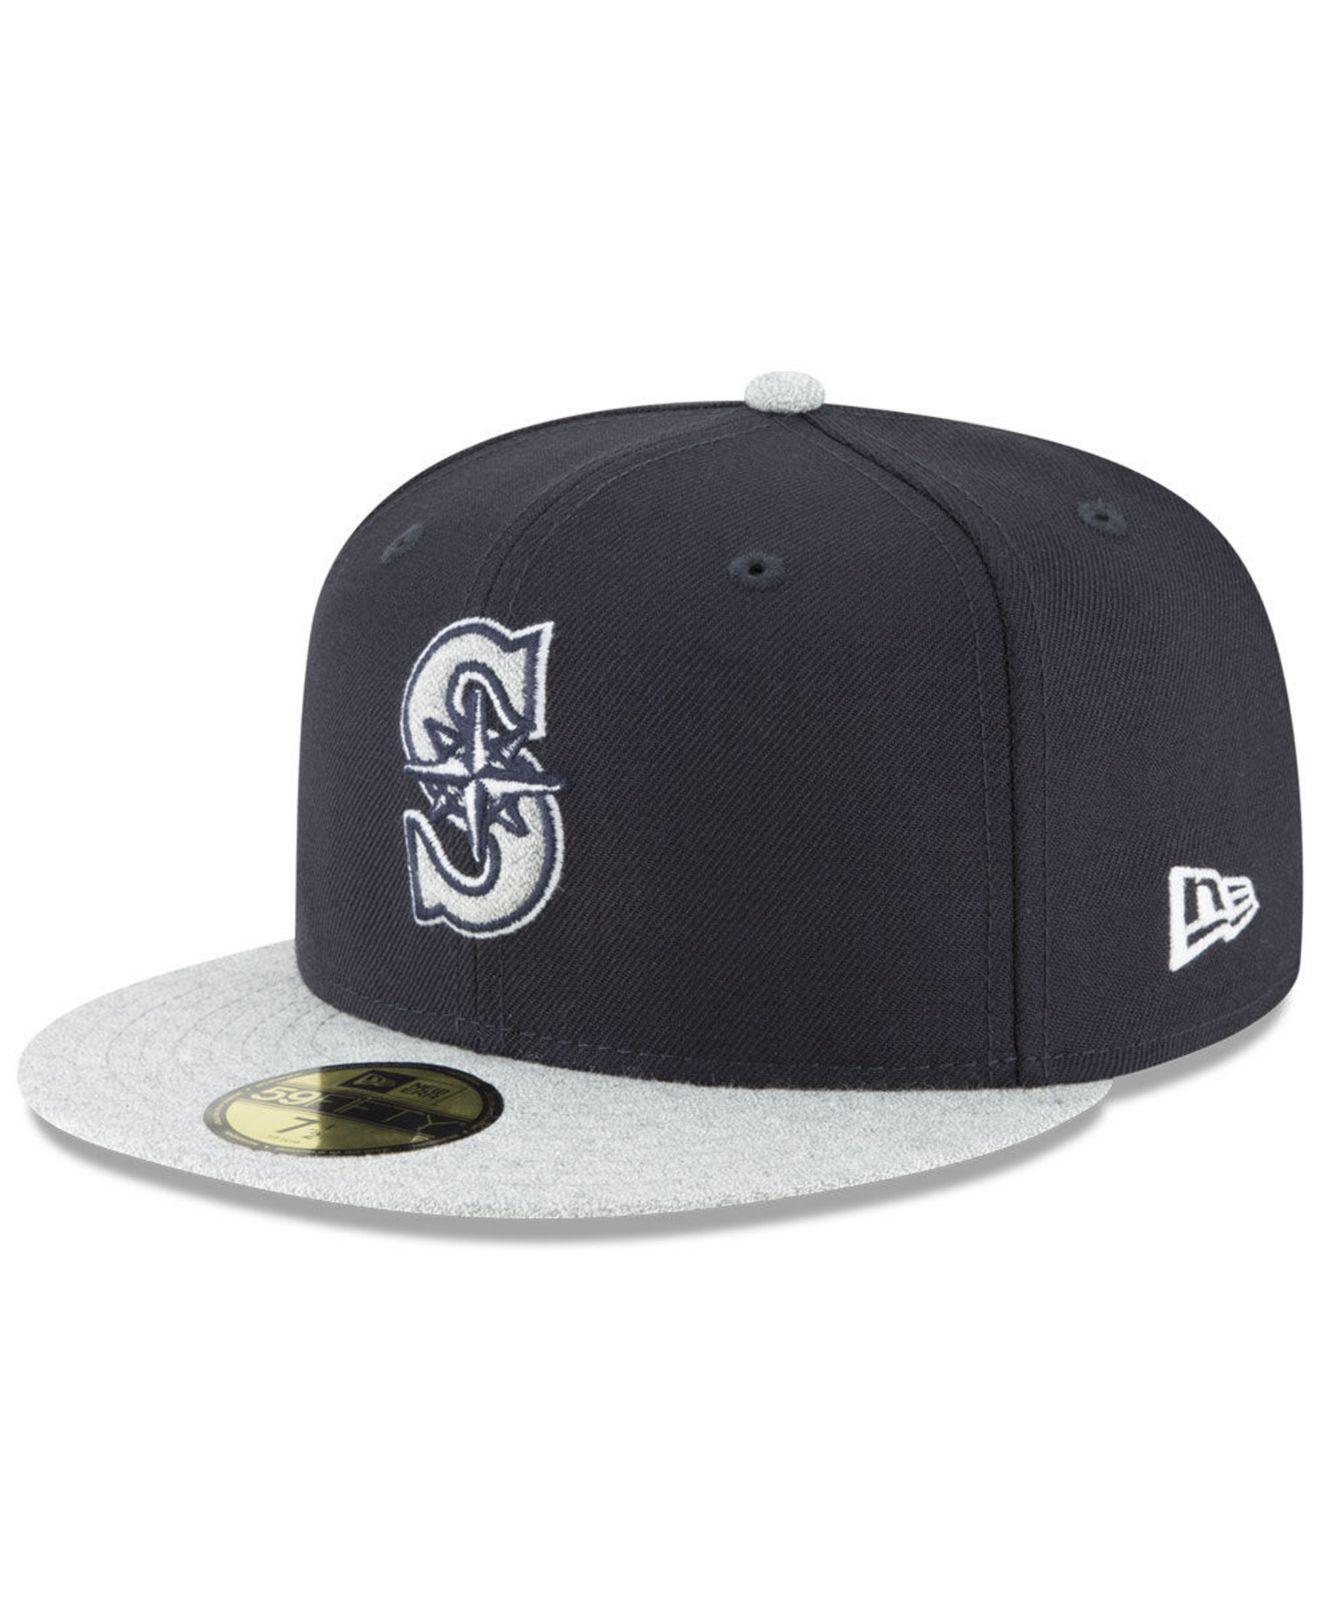 buy online 8da4f 4da1d ... sale ktz. mens blue seattle mariners pop color 59fifty fitted cap 6958a  f4f33